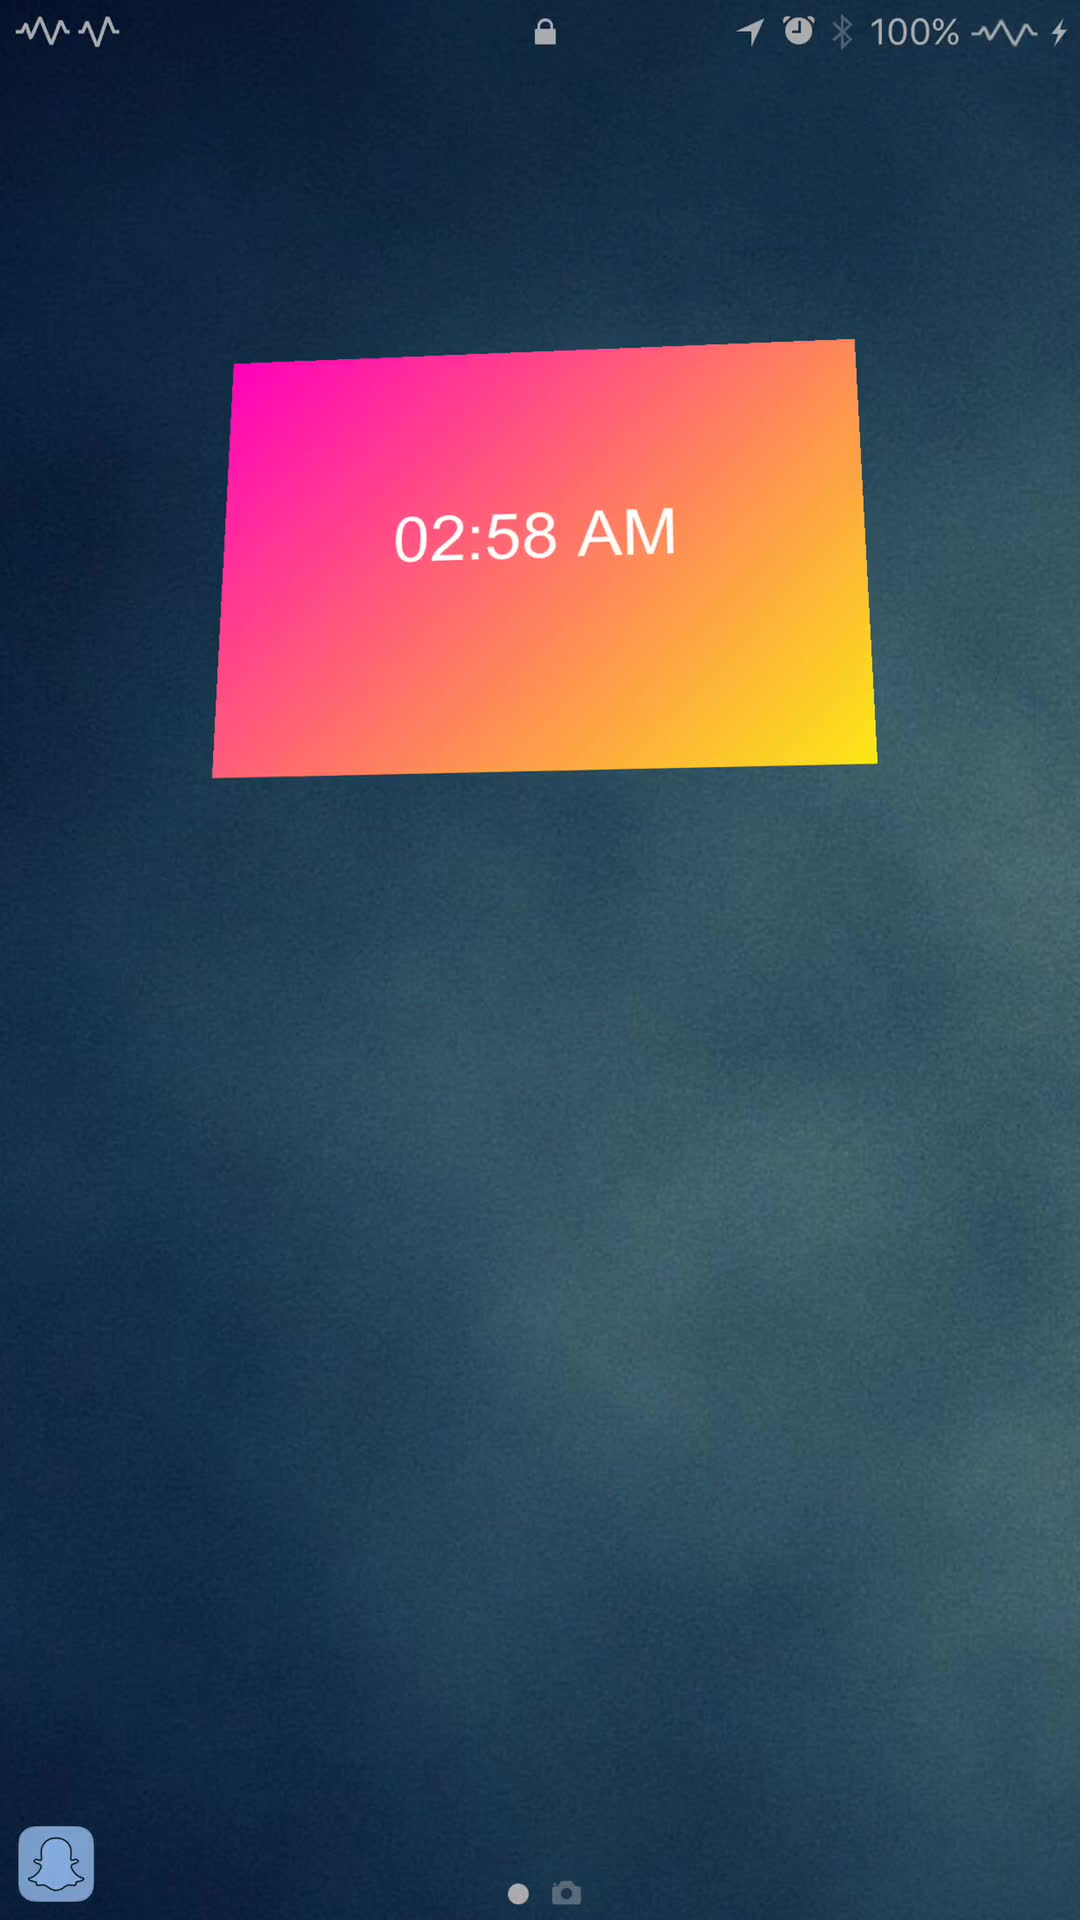 Jailbreak, LockHTML, iOS, iOSThemes, iPhone, TiltLock Preview GIFs